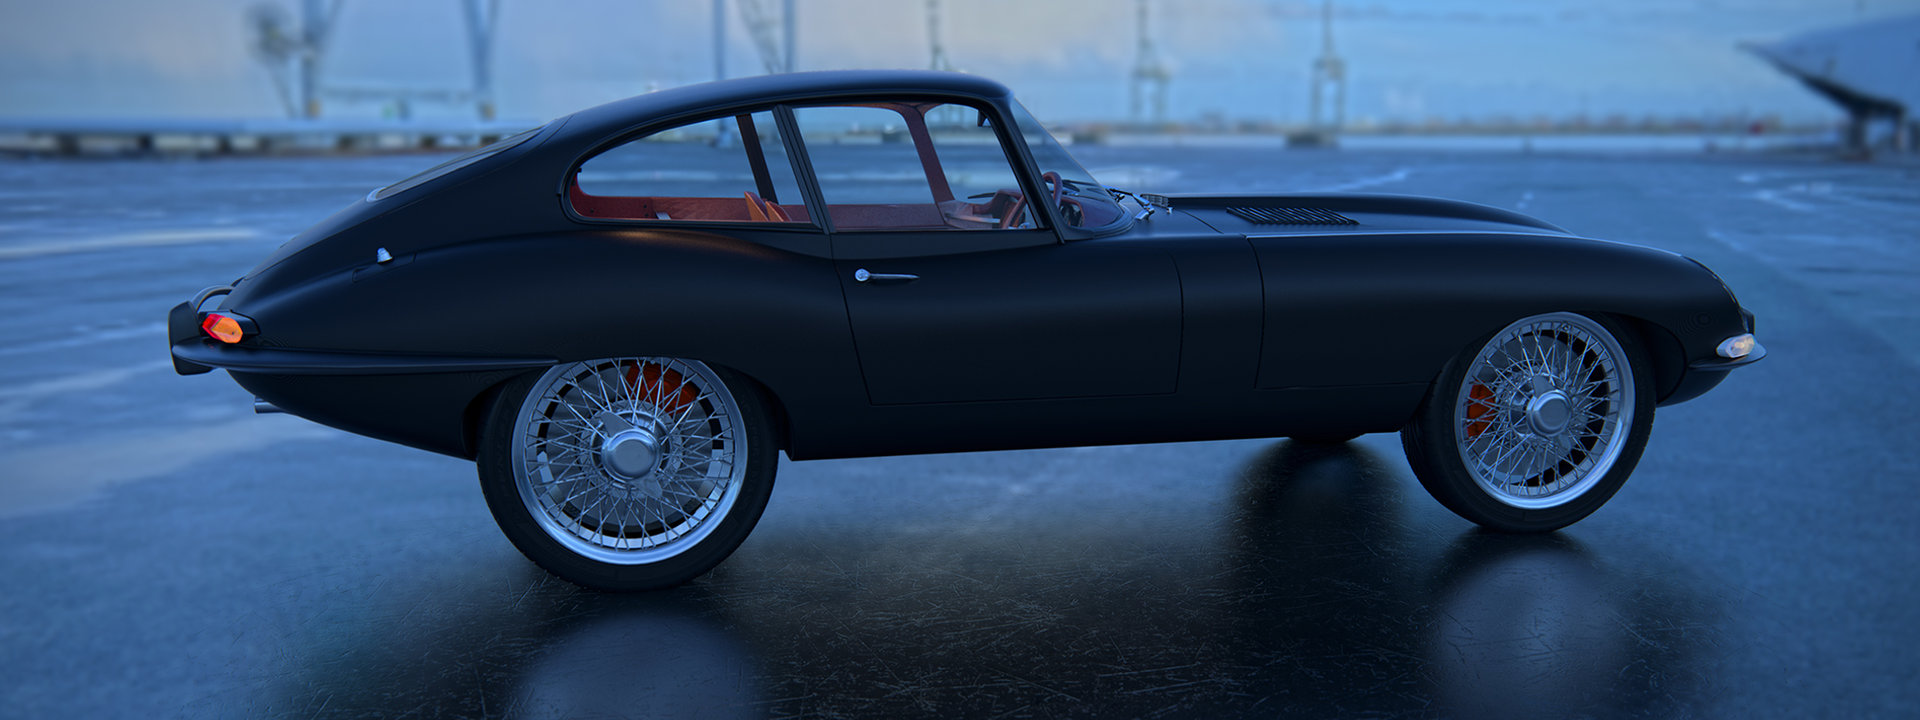 Michael marcondes blkup06 jaguar 1961 e type s1 3